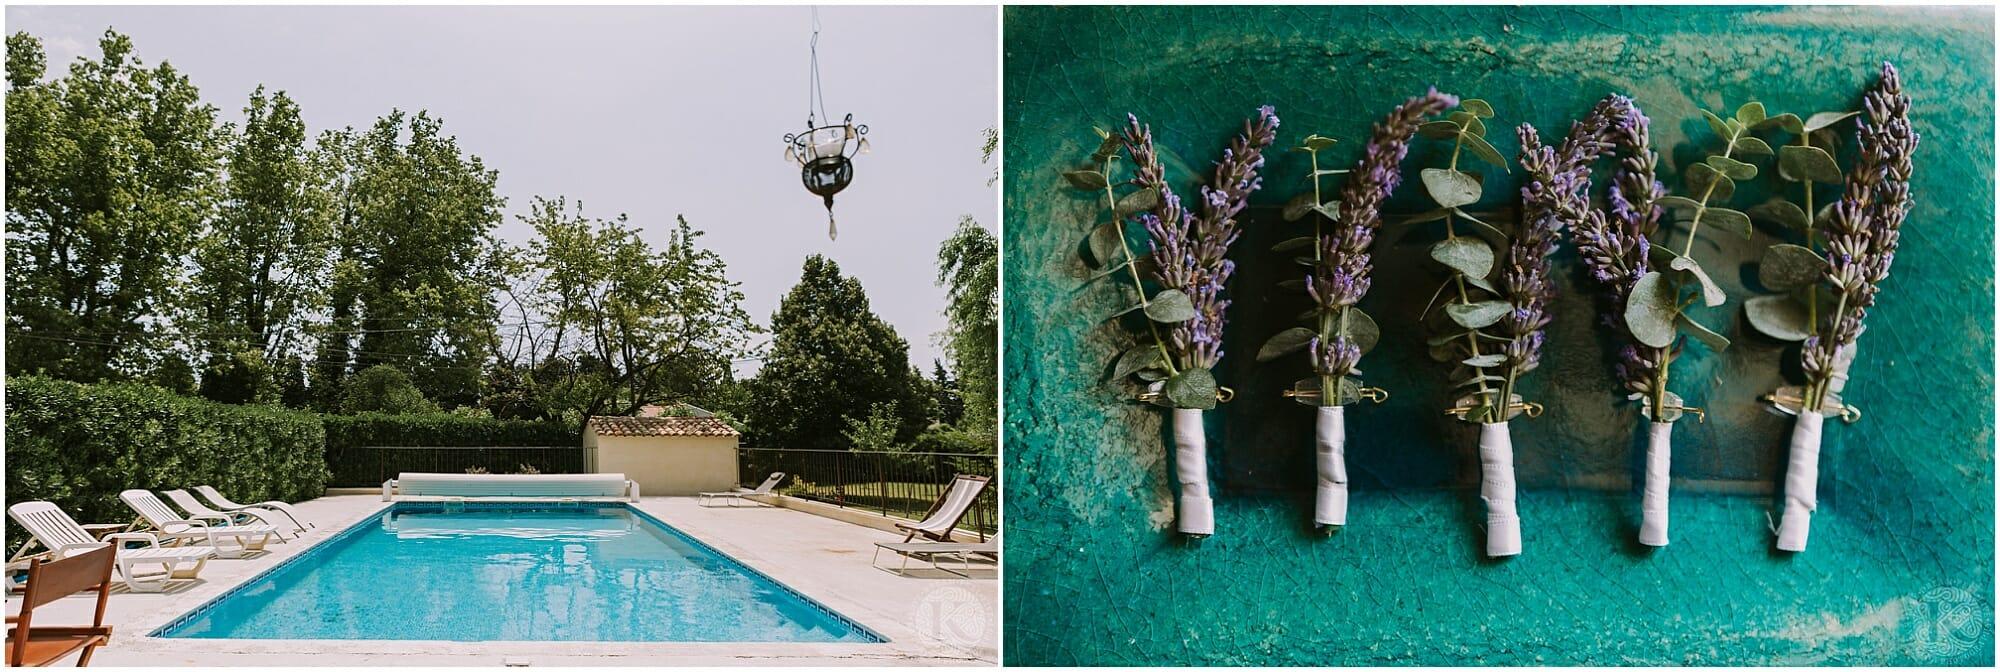 Kateryna-photos-photographe-mariage-chateau-des-3-fontaines-provence-avignon-vaucluse-sud_0006.jpg